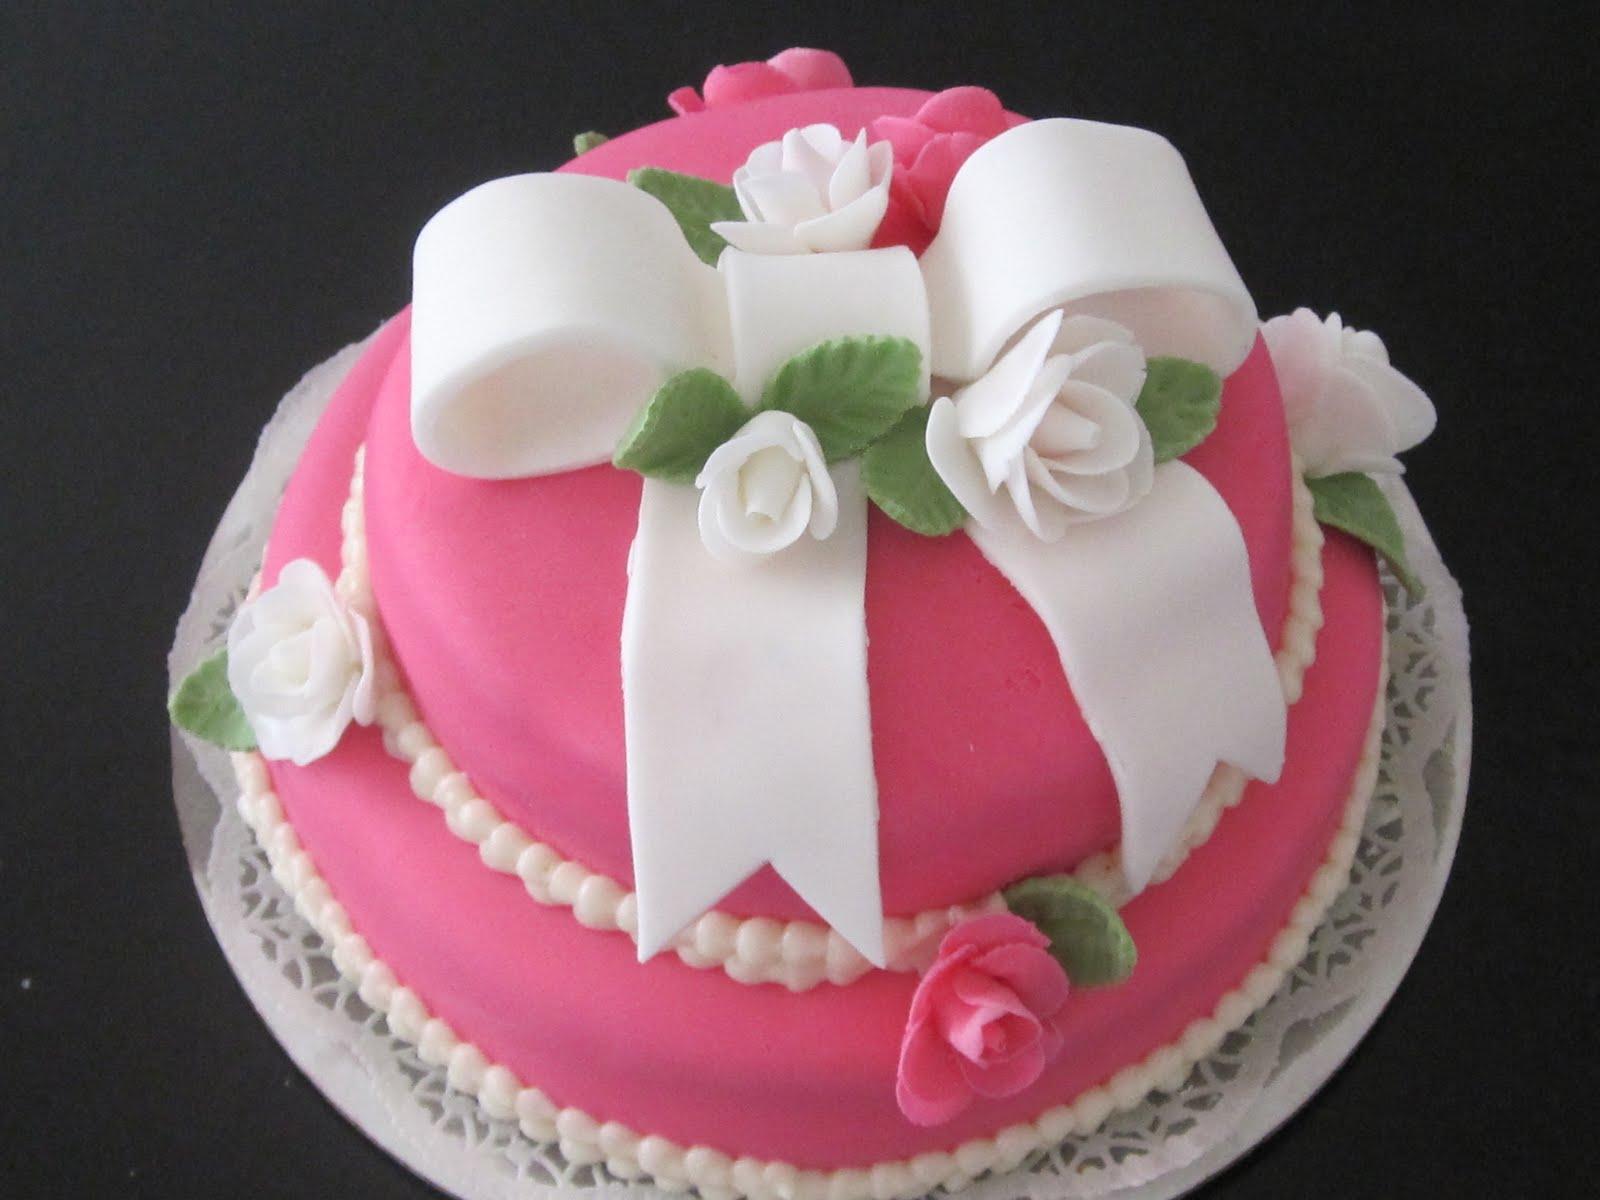 Cakes By Laurel Girls Birthday Cakes